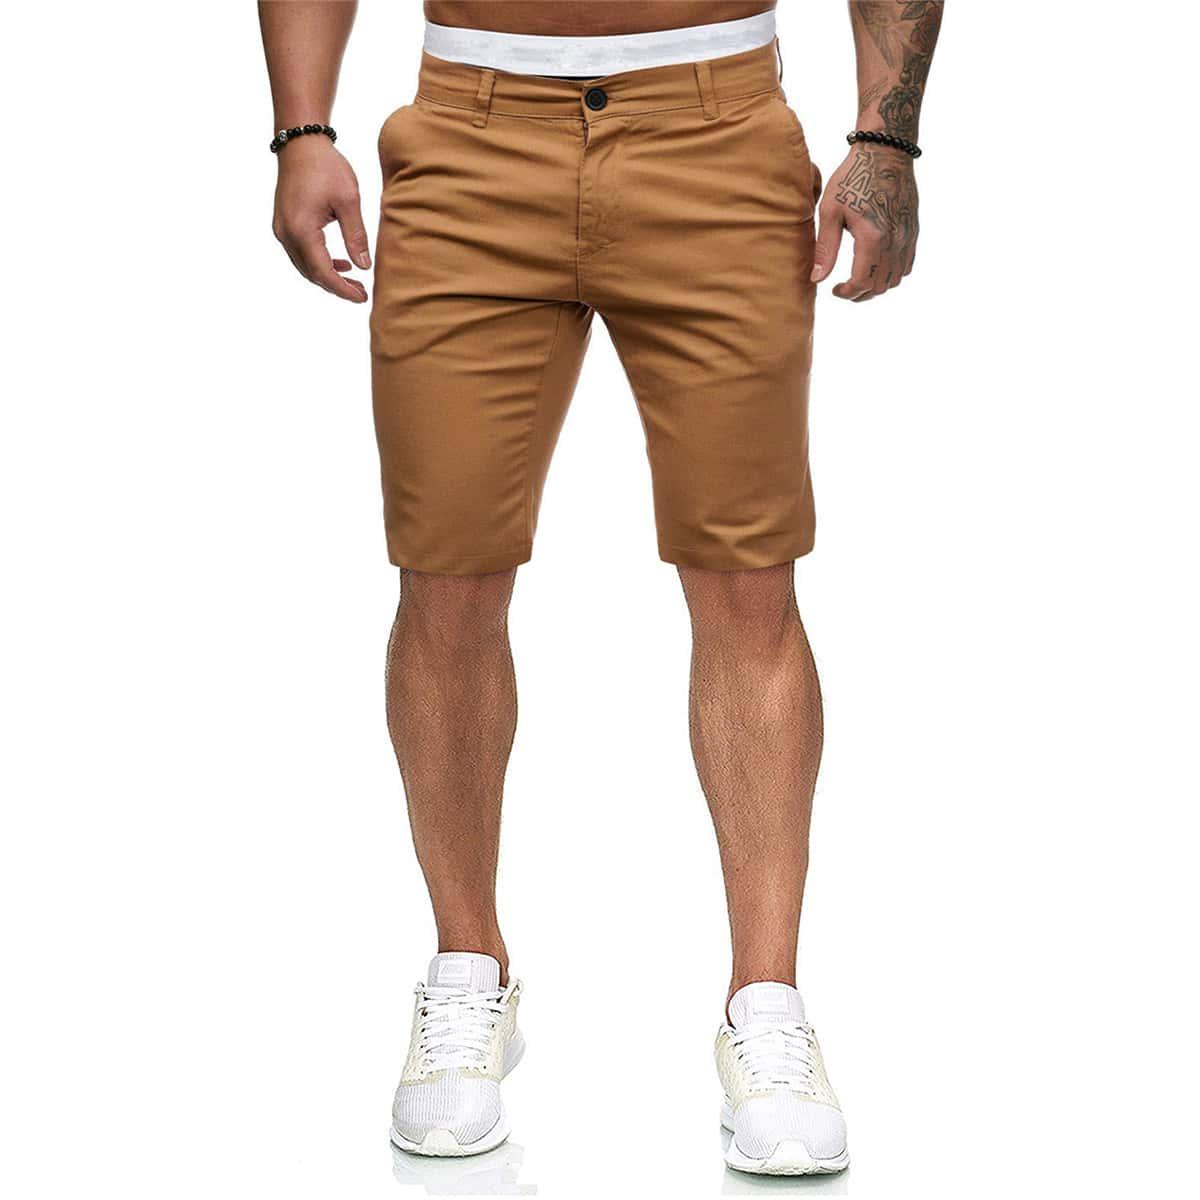 Мужские шорты с карманом